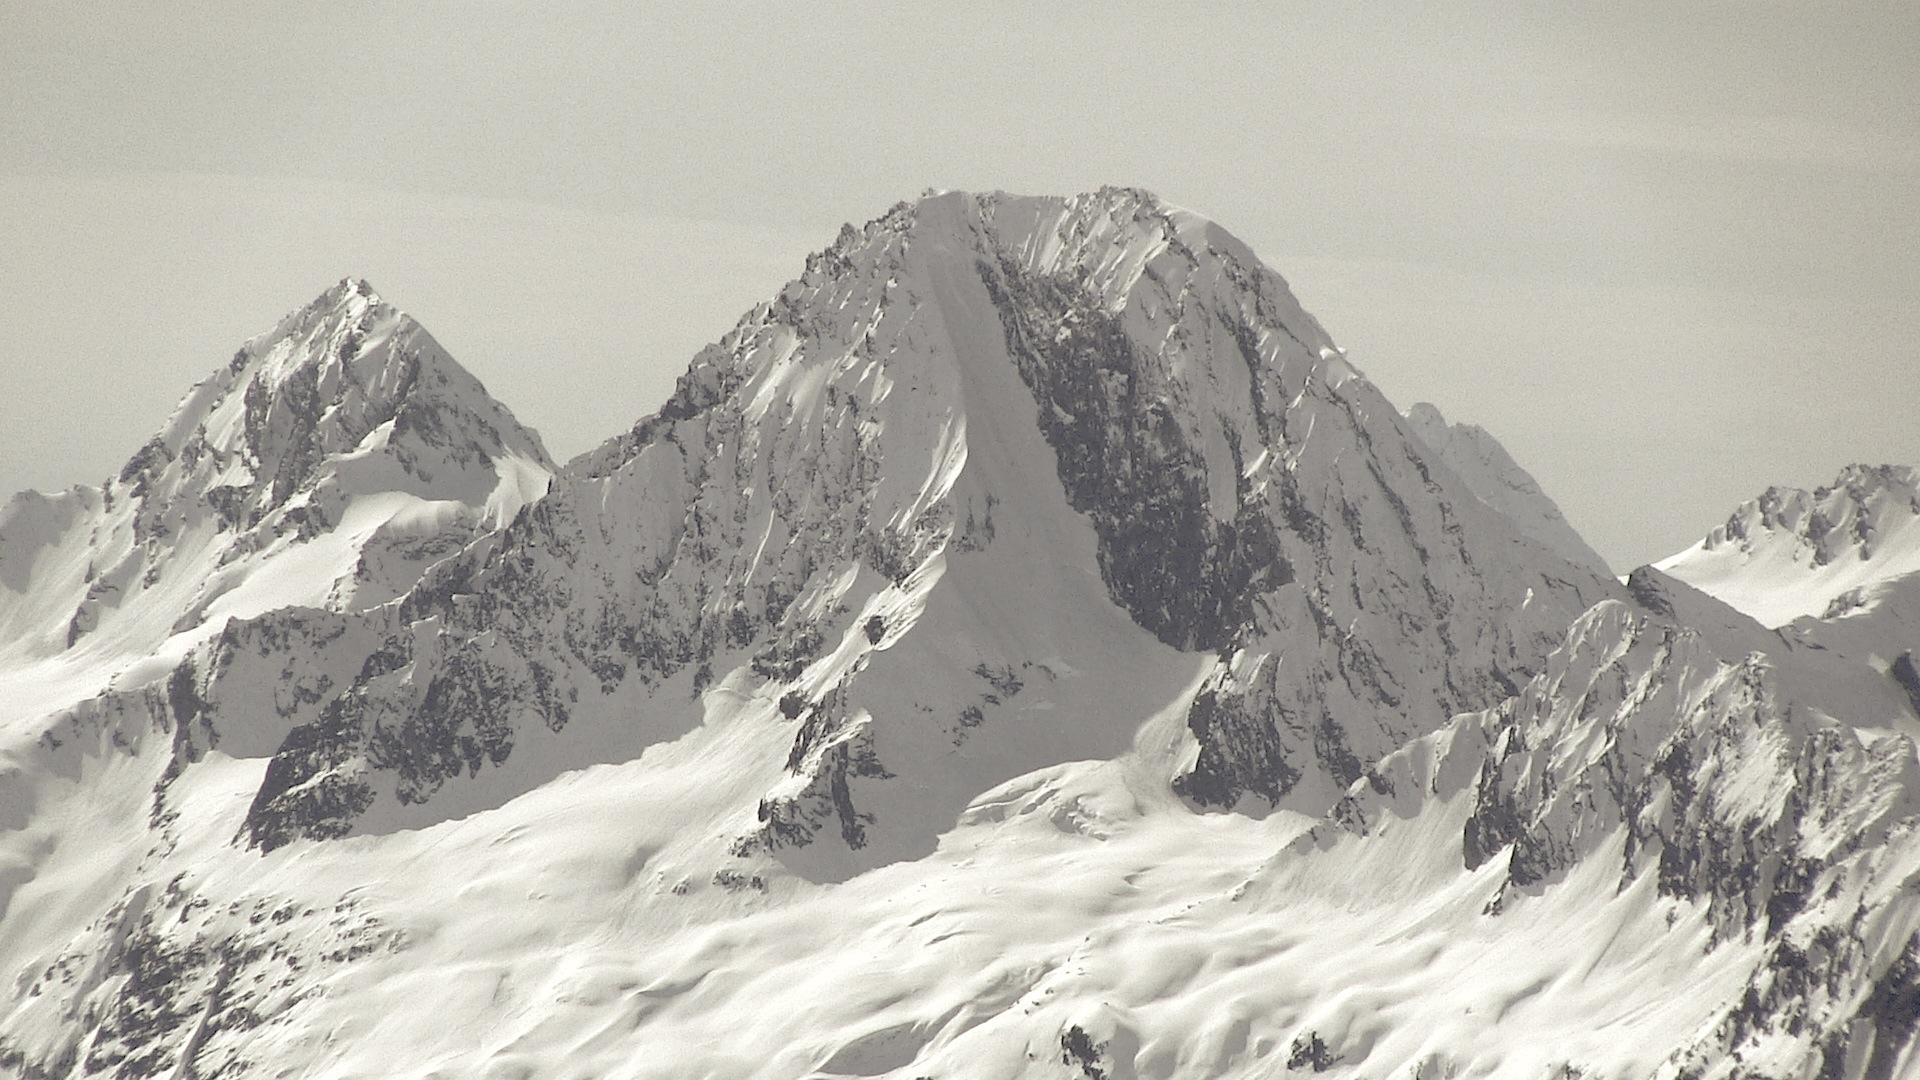 Meteorite Mountain, AK in April 2012. photo: miles clark/snowbrains